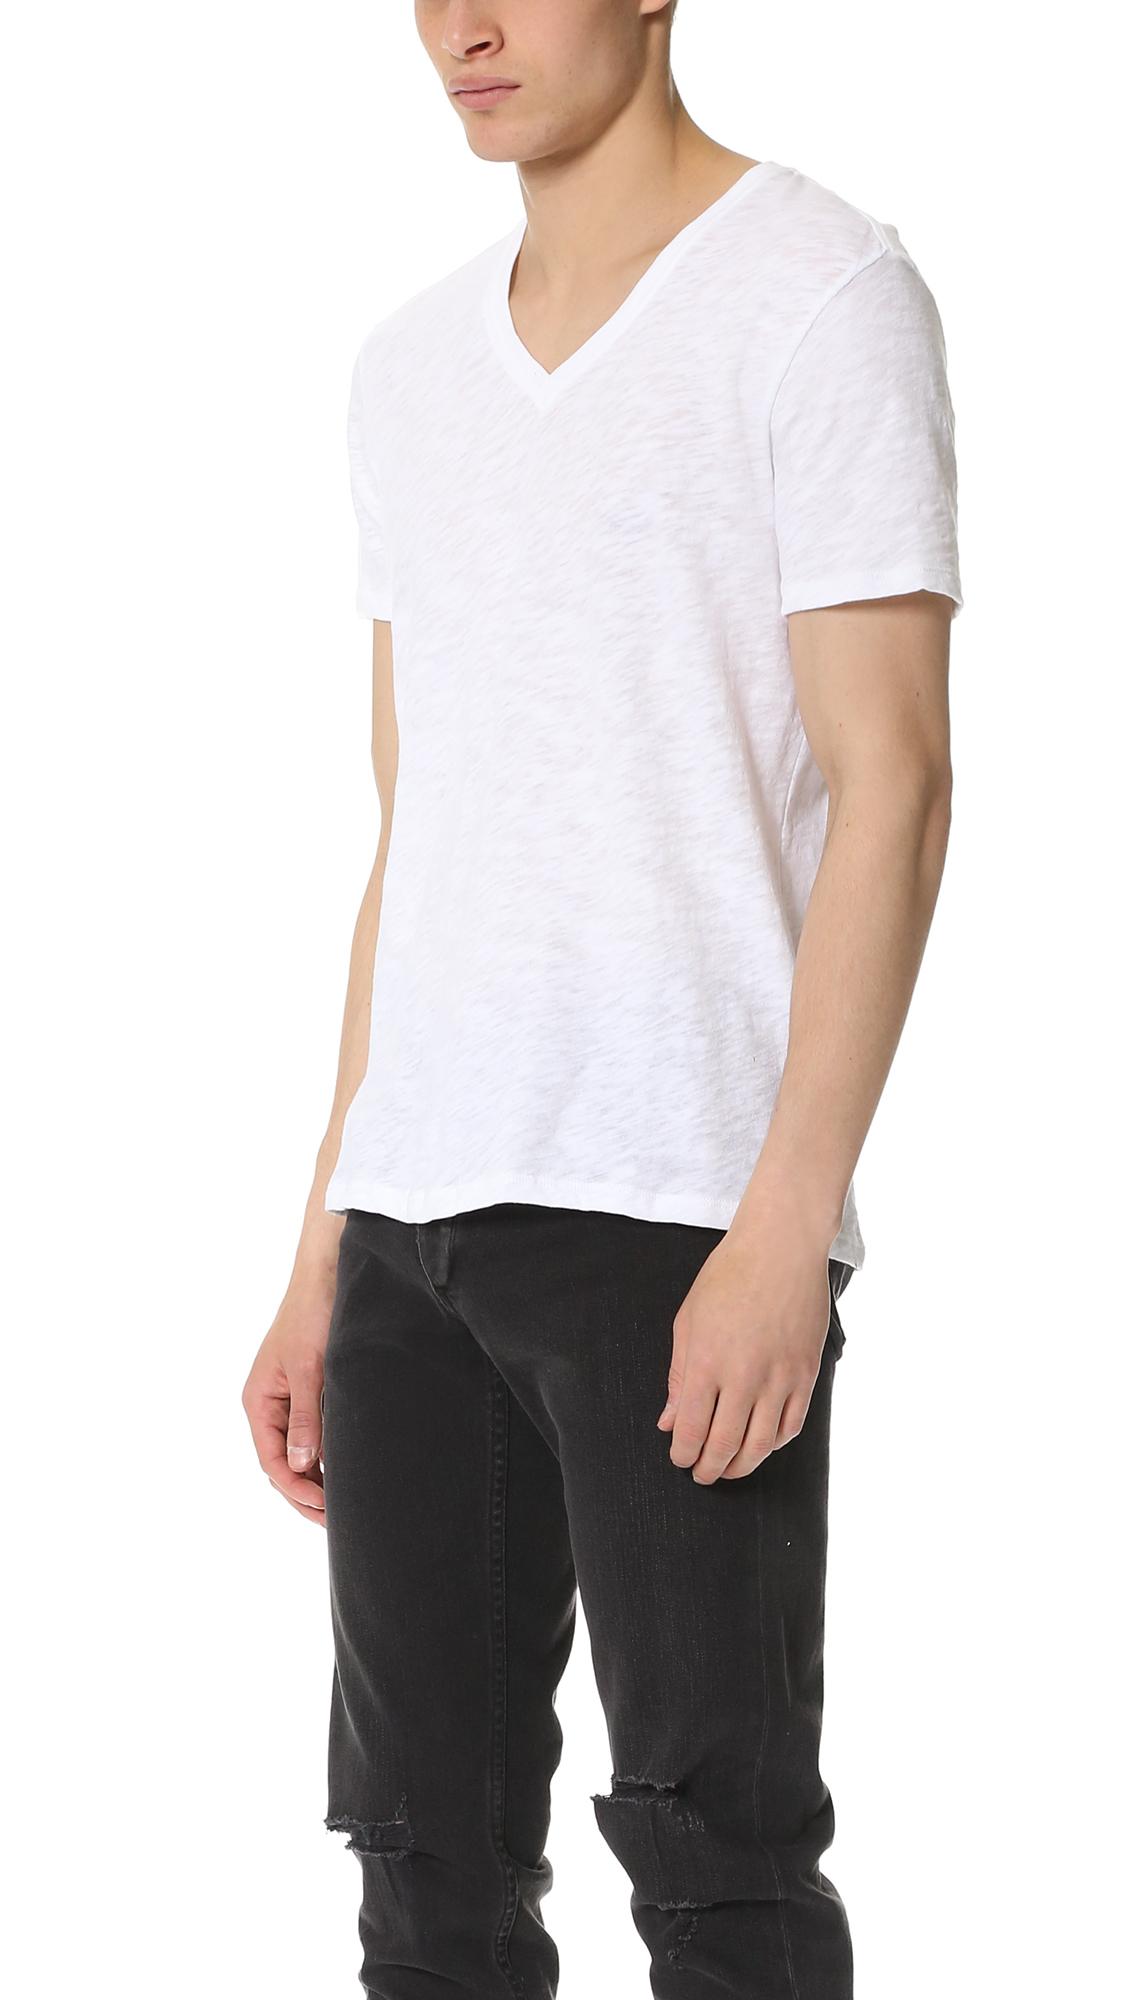 Lyst atm v neck slub jersey t shirt in white for men for What is a slub shirt